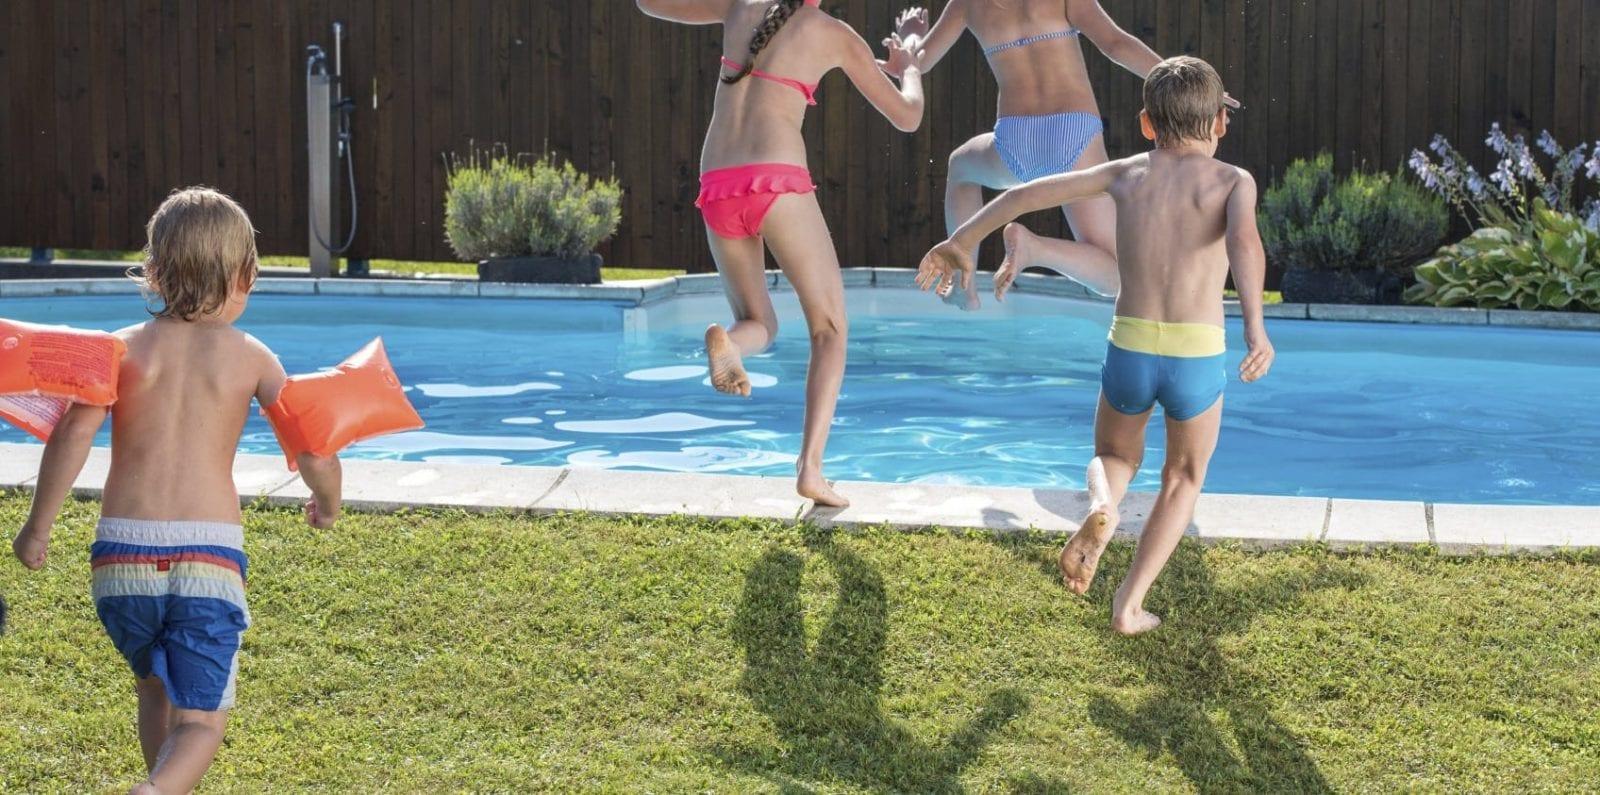 Pool Accident | Peter N. Davis LLC